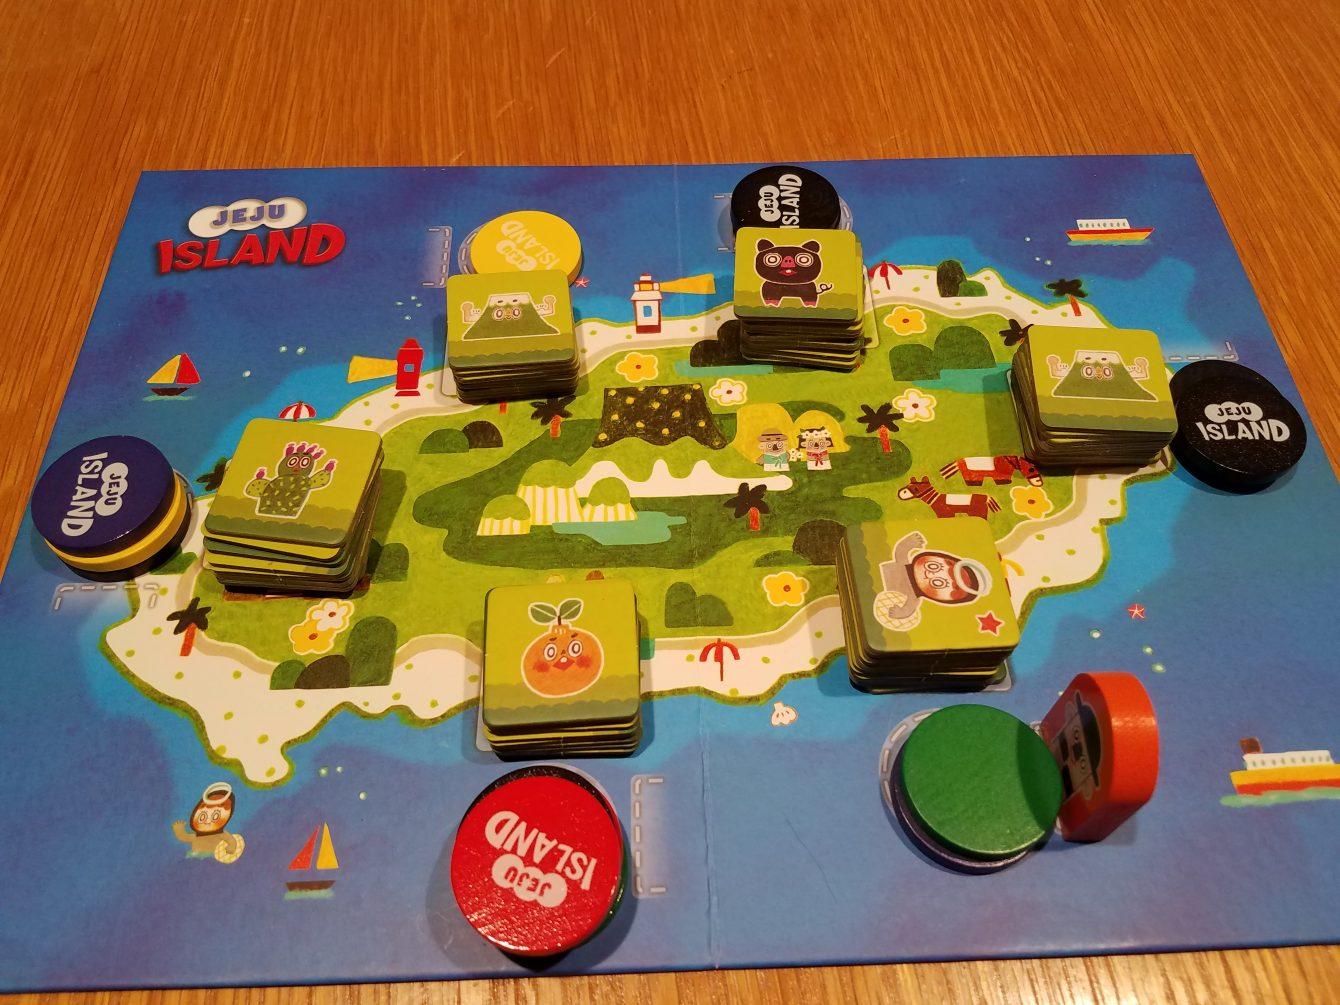 Case Blue Board Game : Jeju island review gameosity